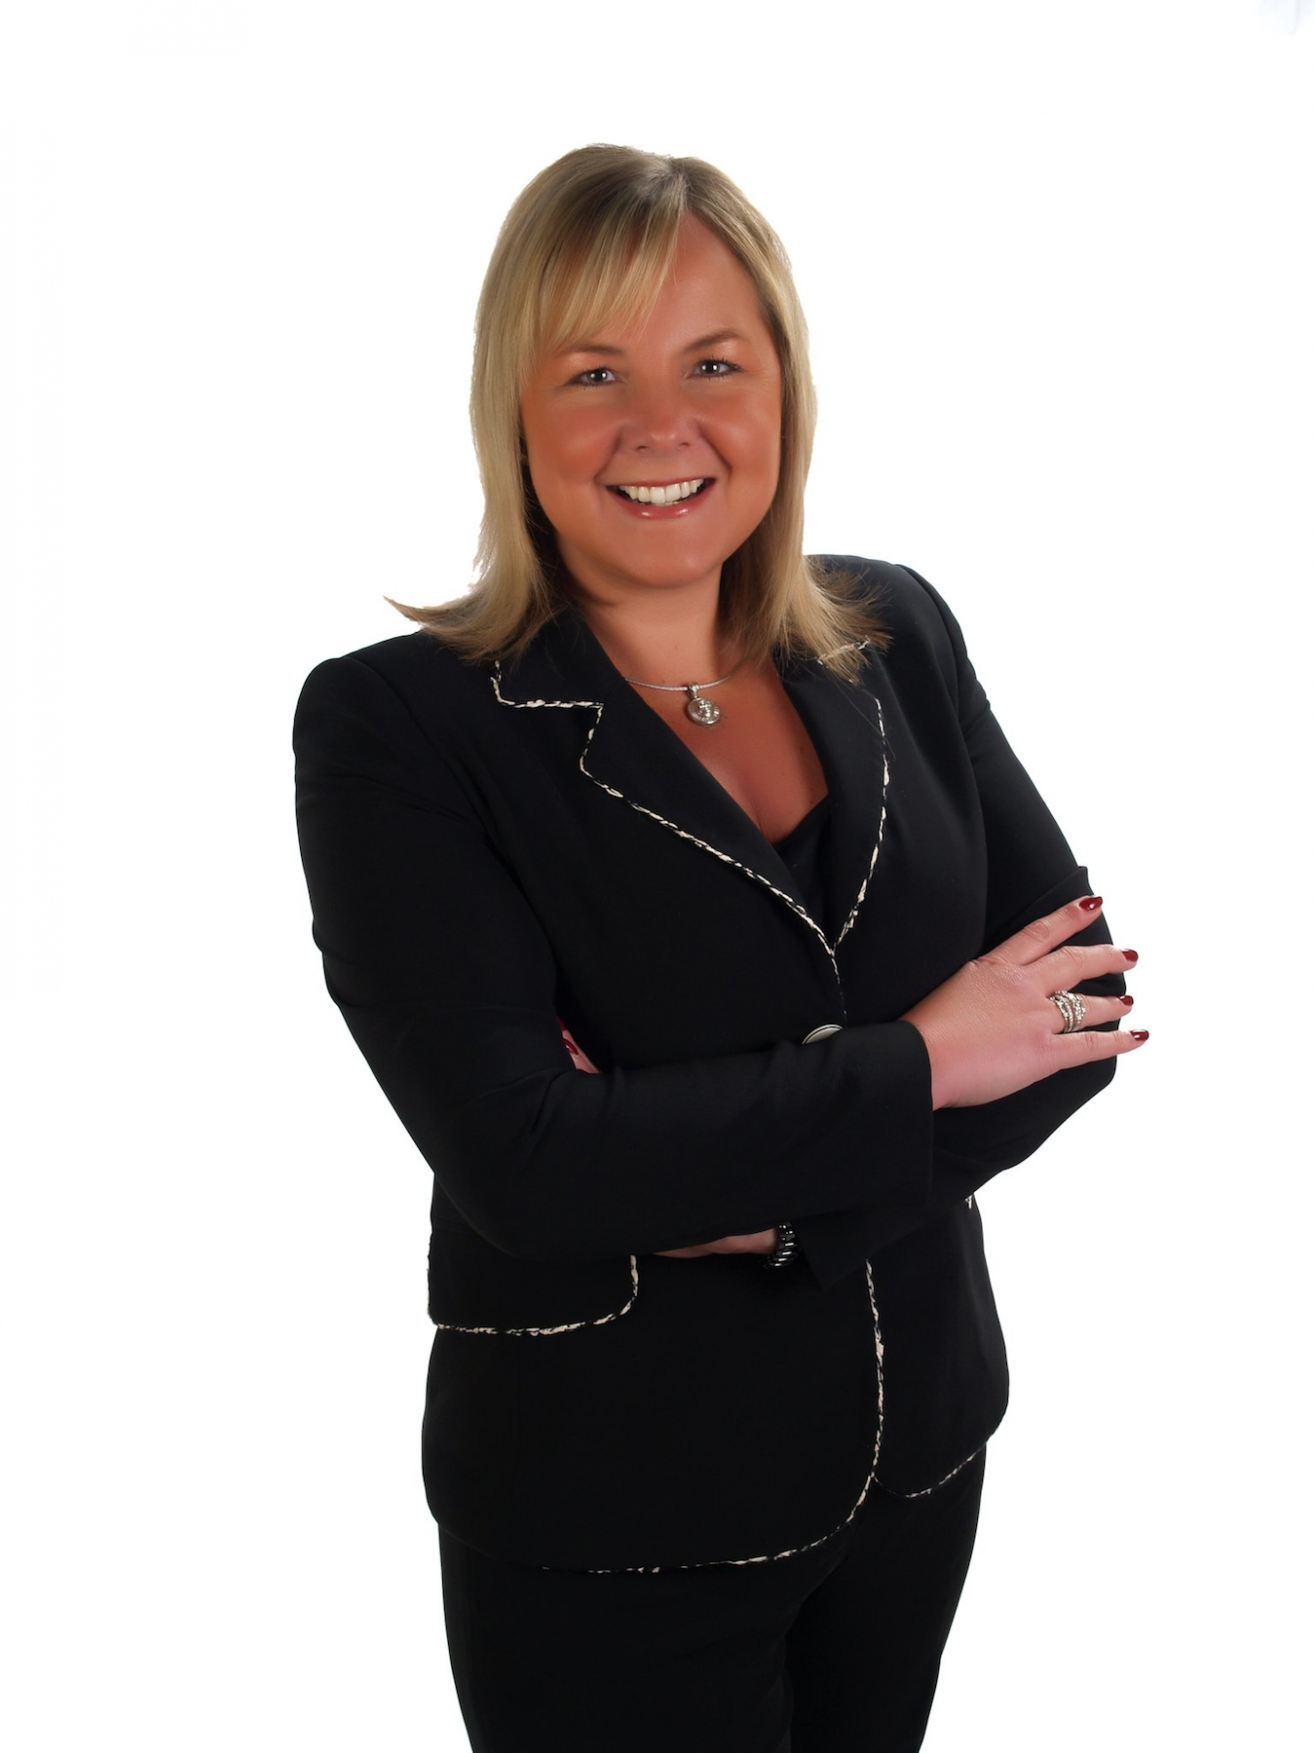 Denise Swick